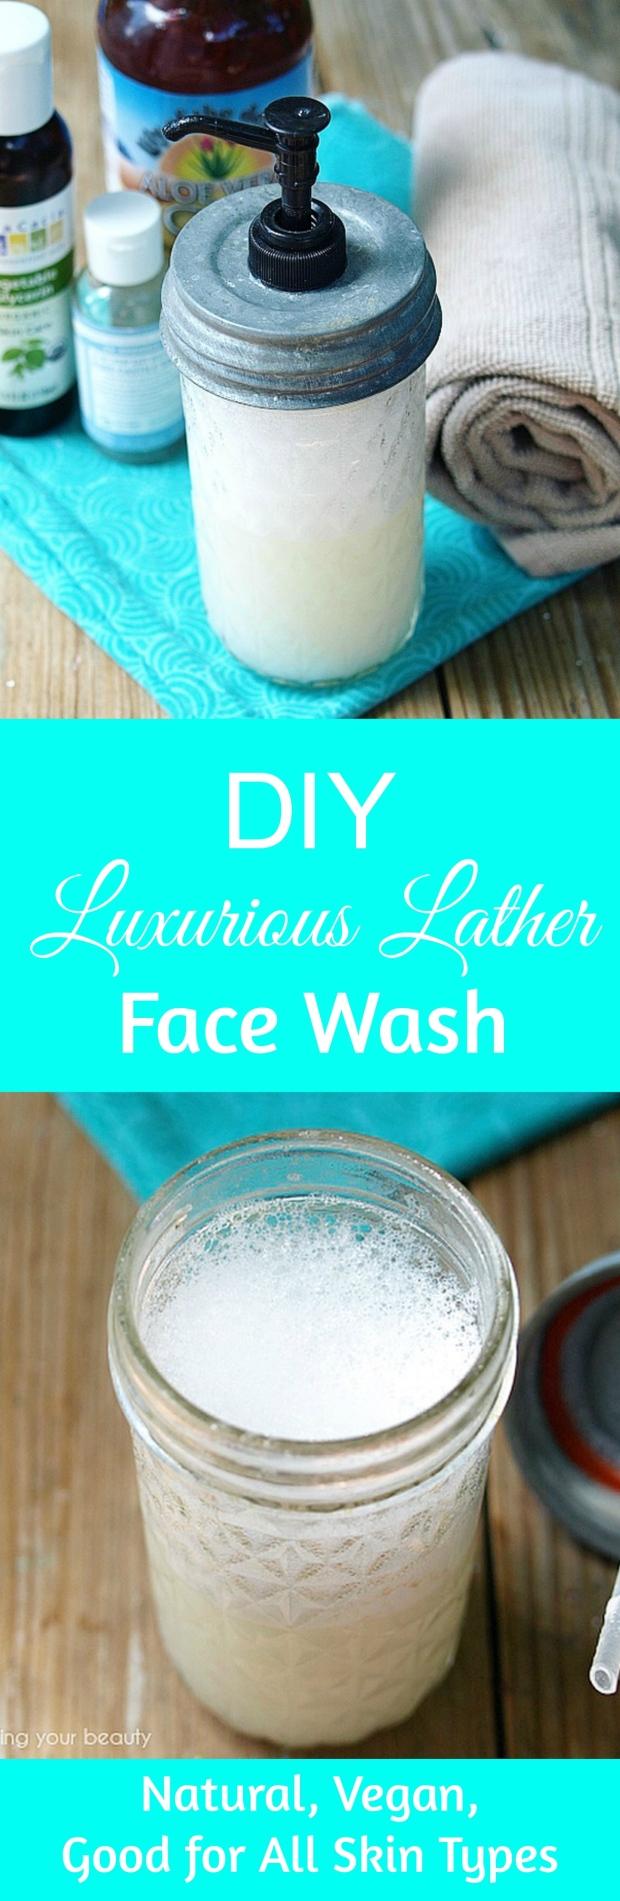 DIY Luxurious Lather Face Wash with Aloe - Natural, Vegan, Anti-acne, Anti-Aging